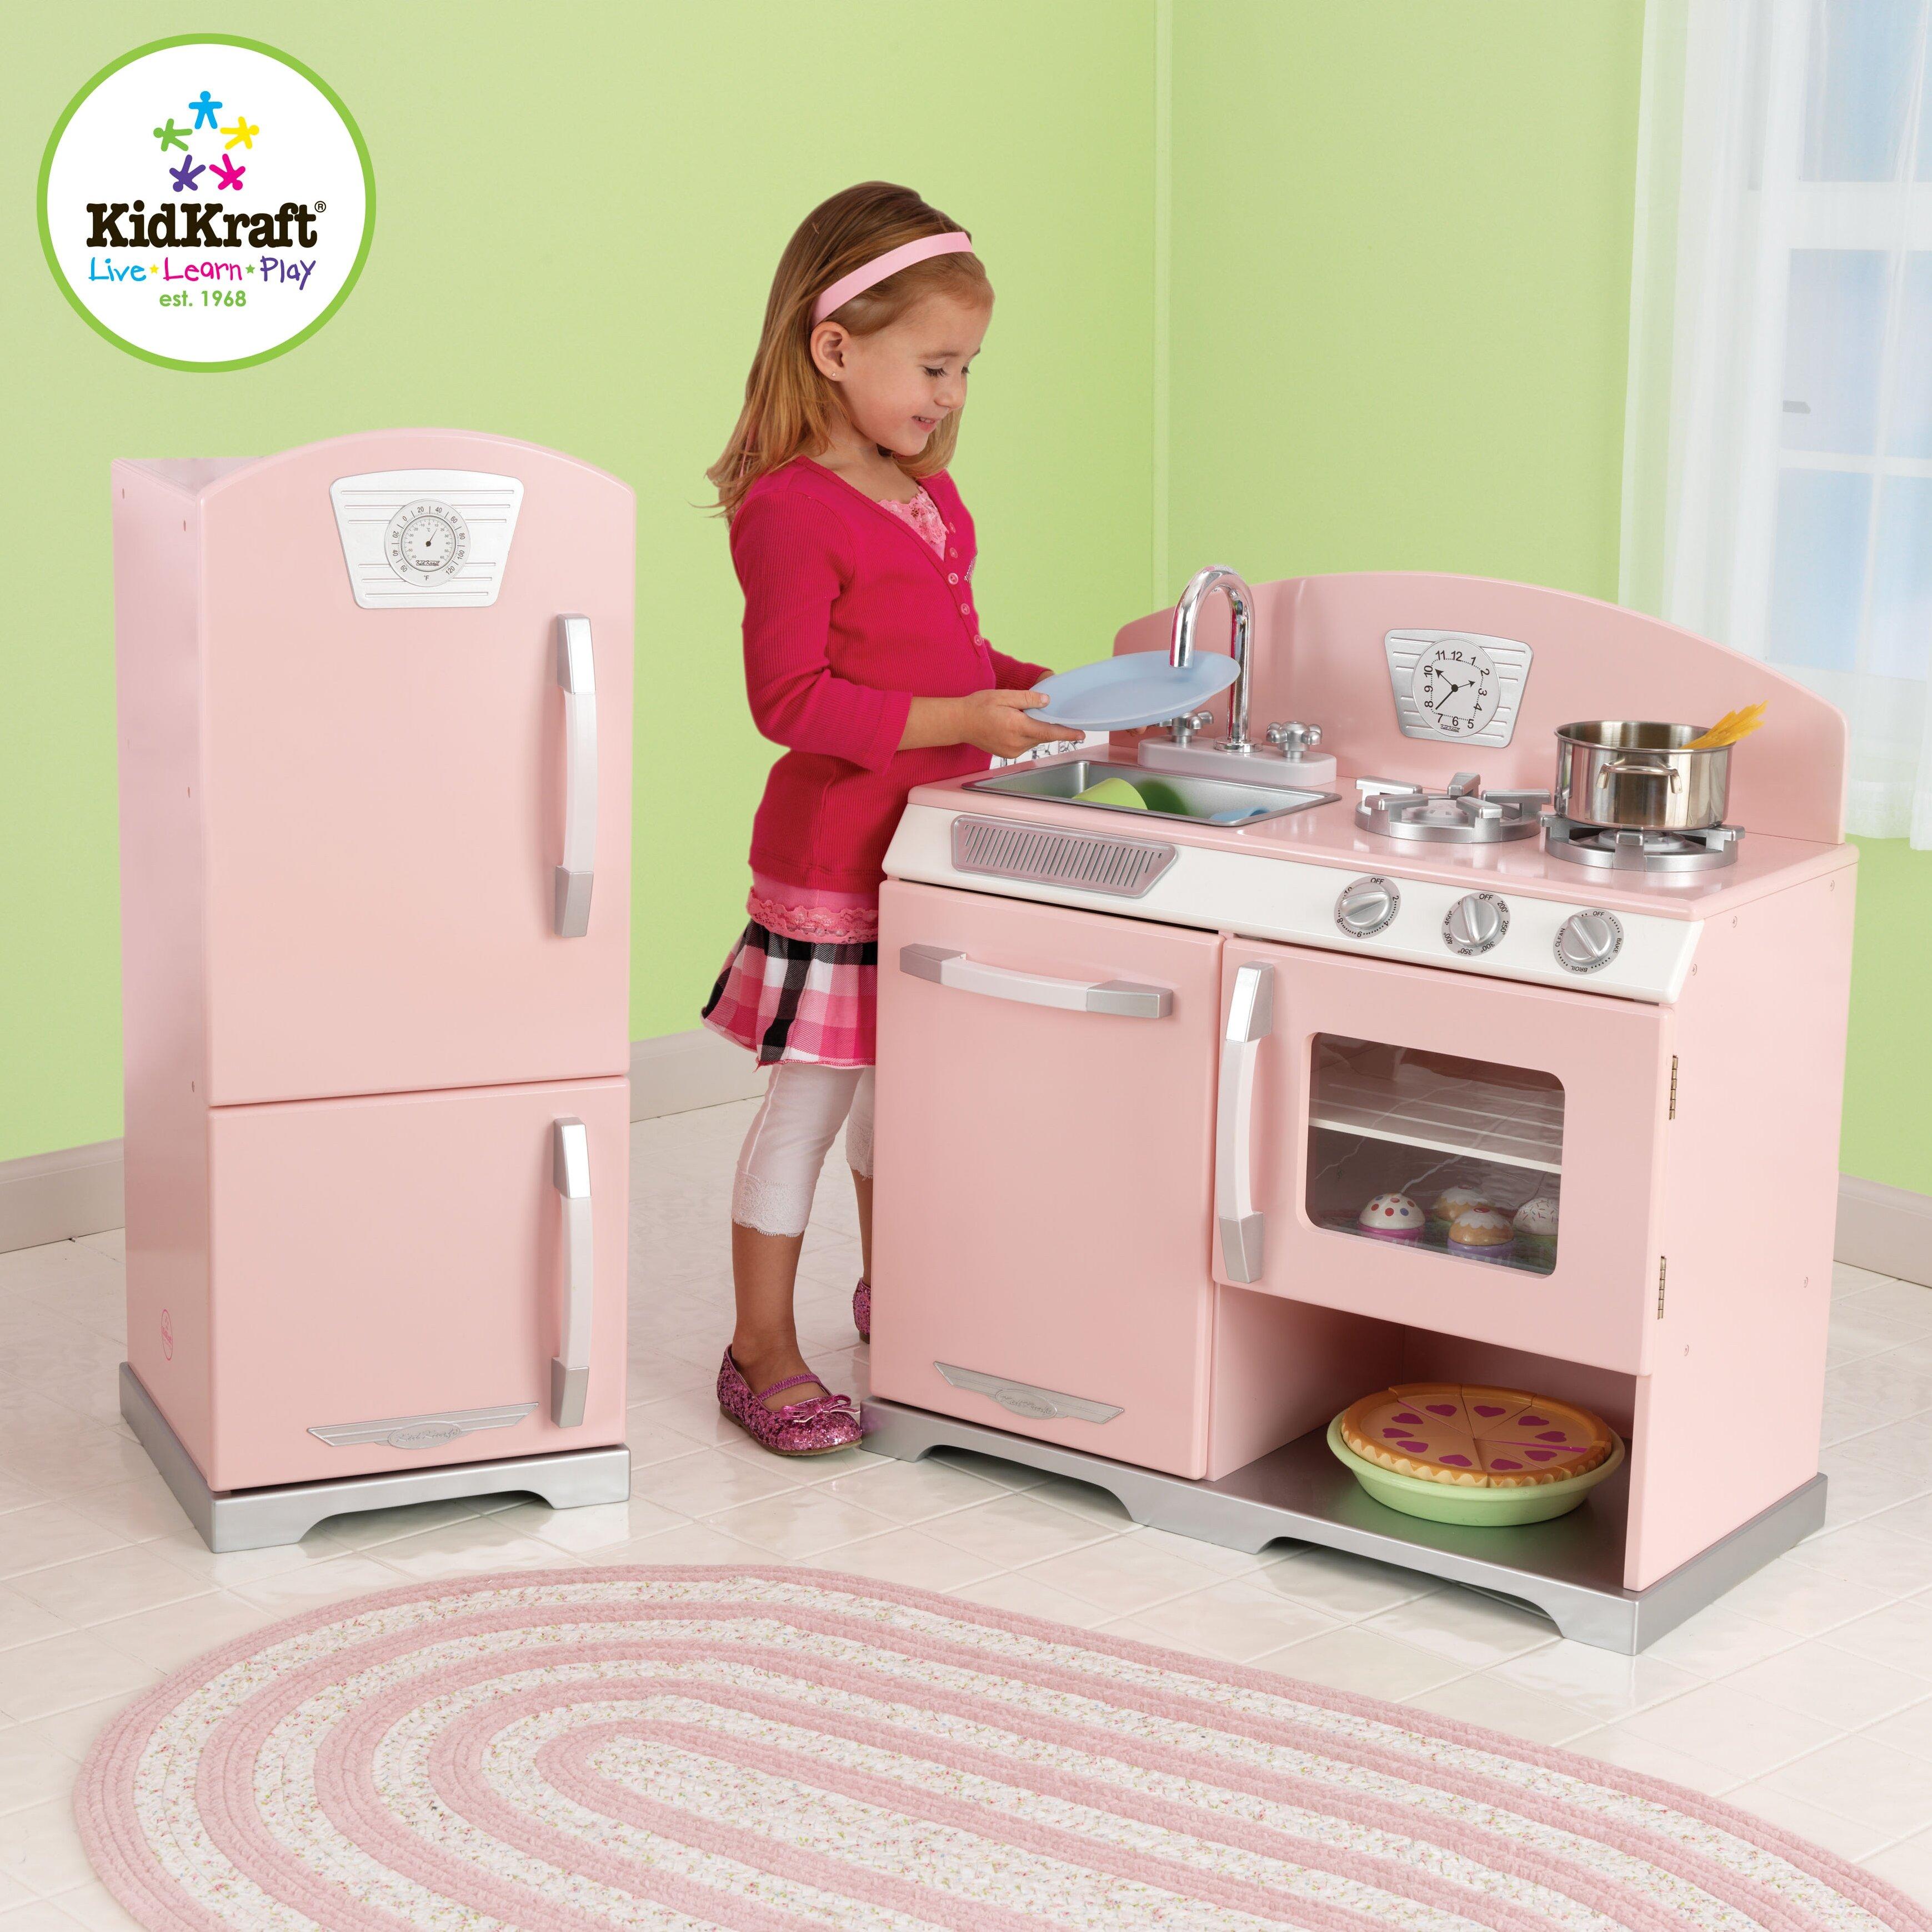 Kidkraft 2 Piece Retro Kitchen And Refrigerator Set Reviews Wayfair